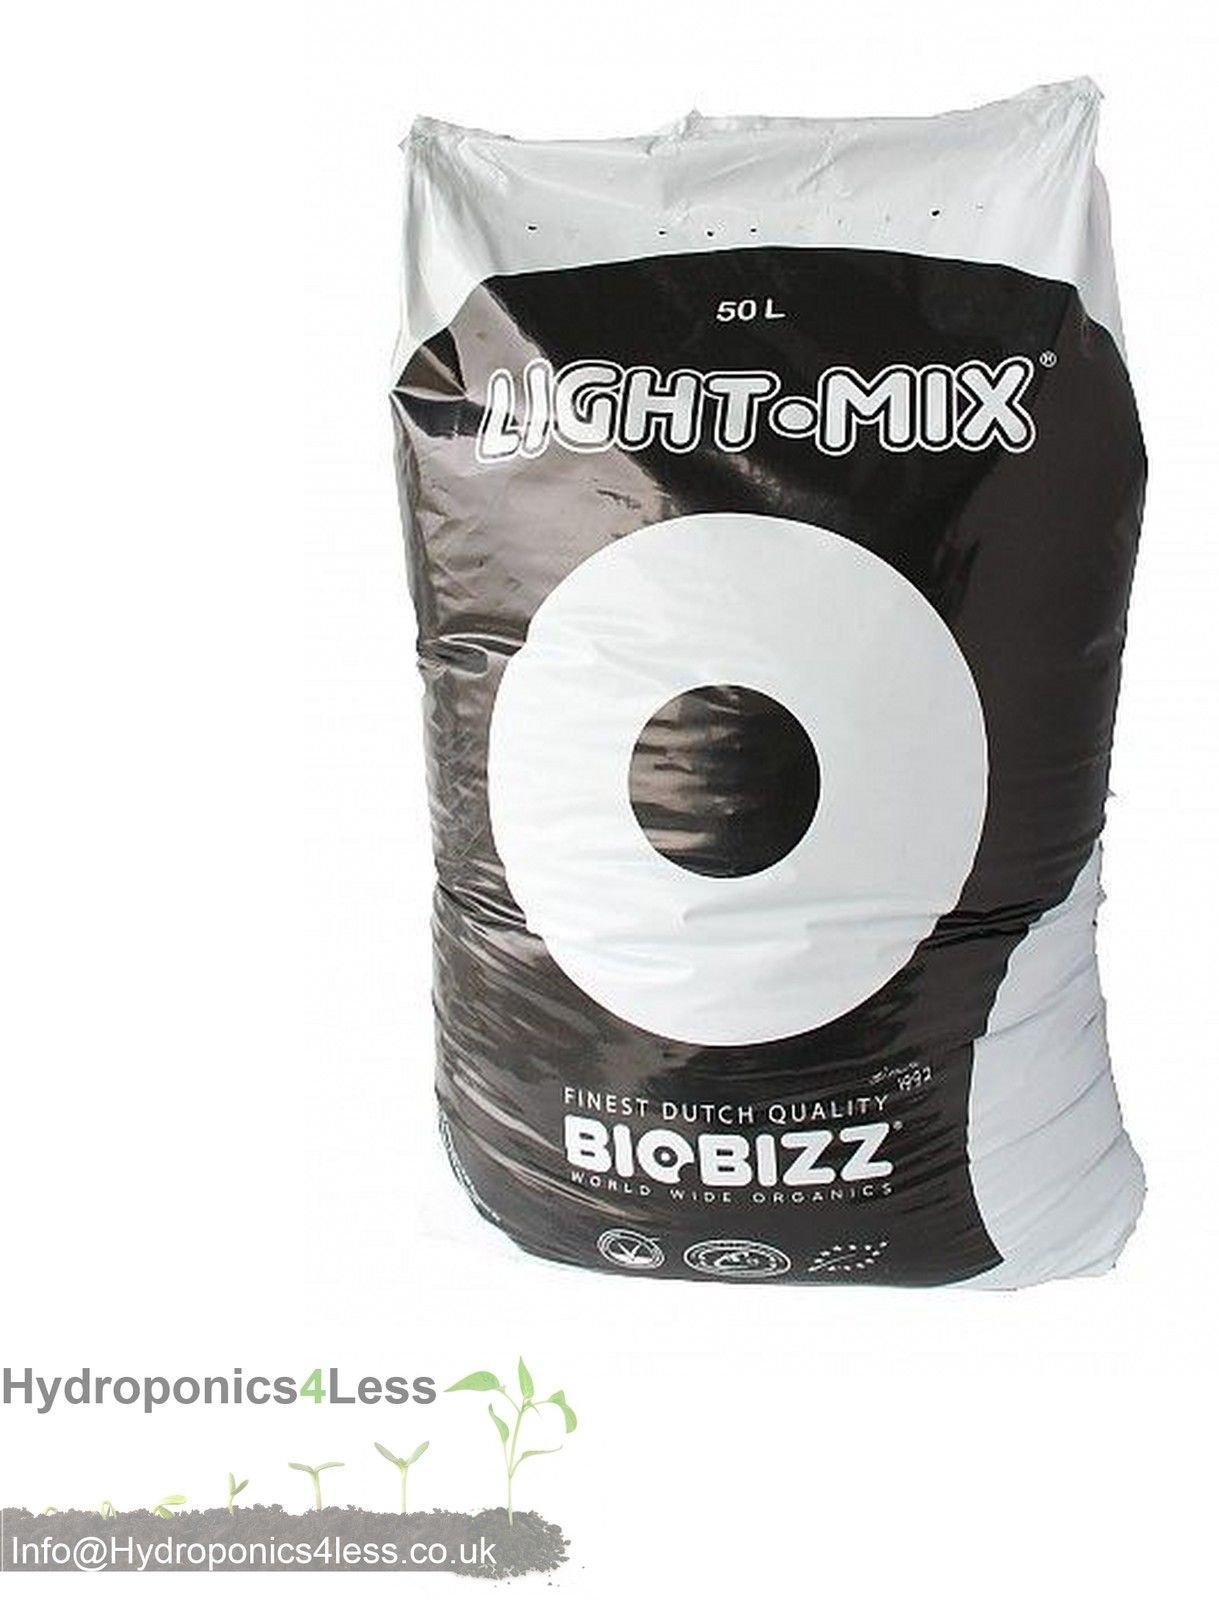 BioBizz Light Mix 50L 20L & 10L Organic Soil Potting Compost Hydroponics Growing (20 Litre)